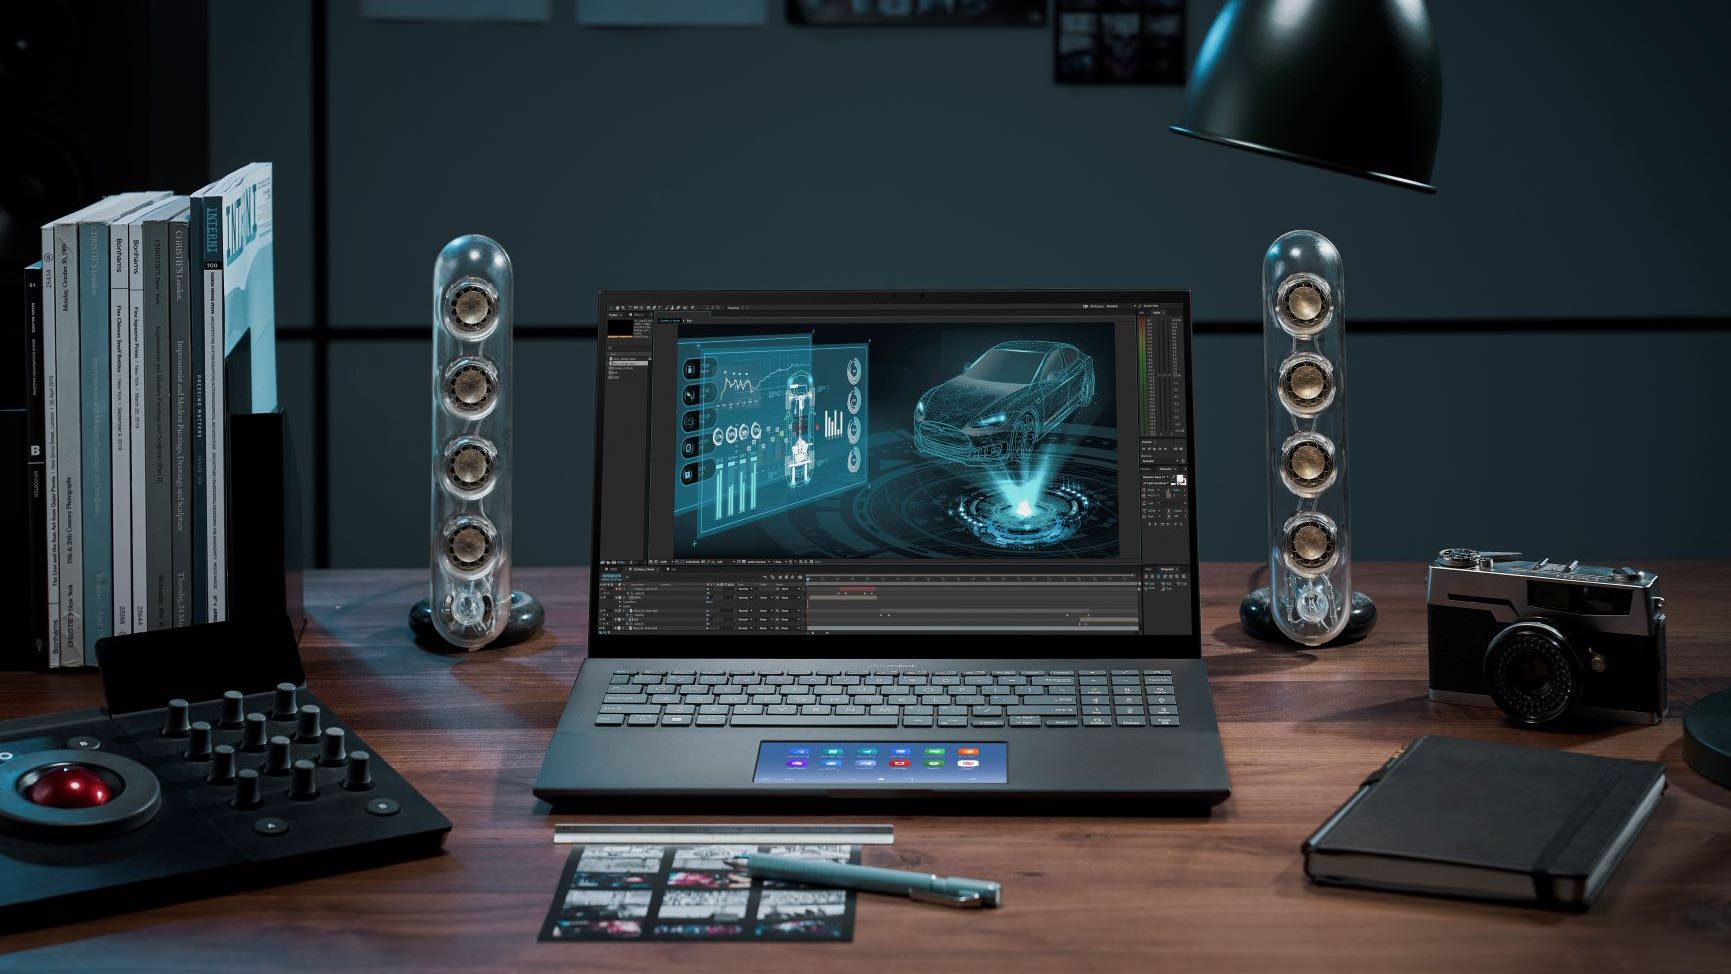 ASUS ZenBook Pro 15 UX535